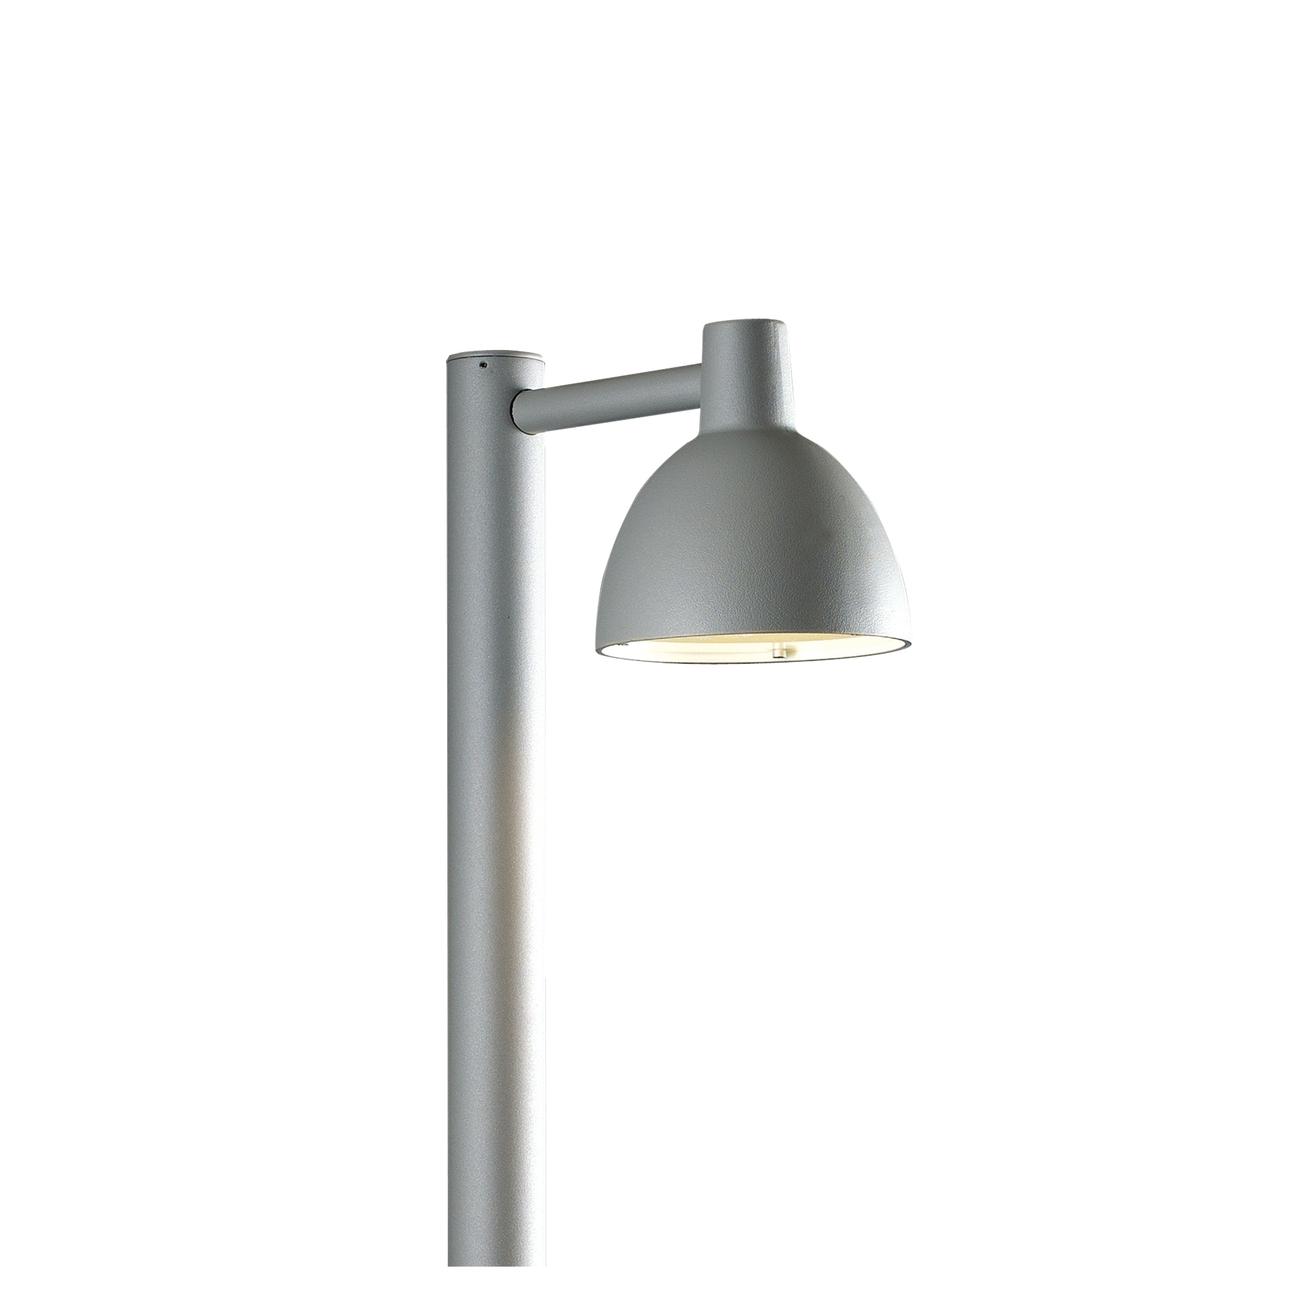 Louis Poulsen Toldbod 155 Bollard Outdoor vloerlamp-Grijs